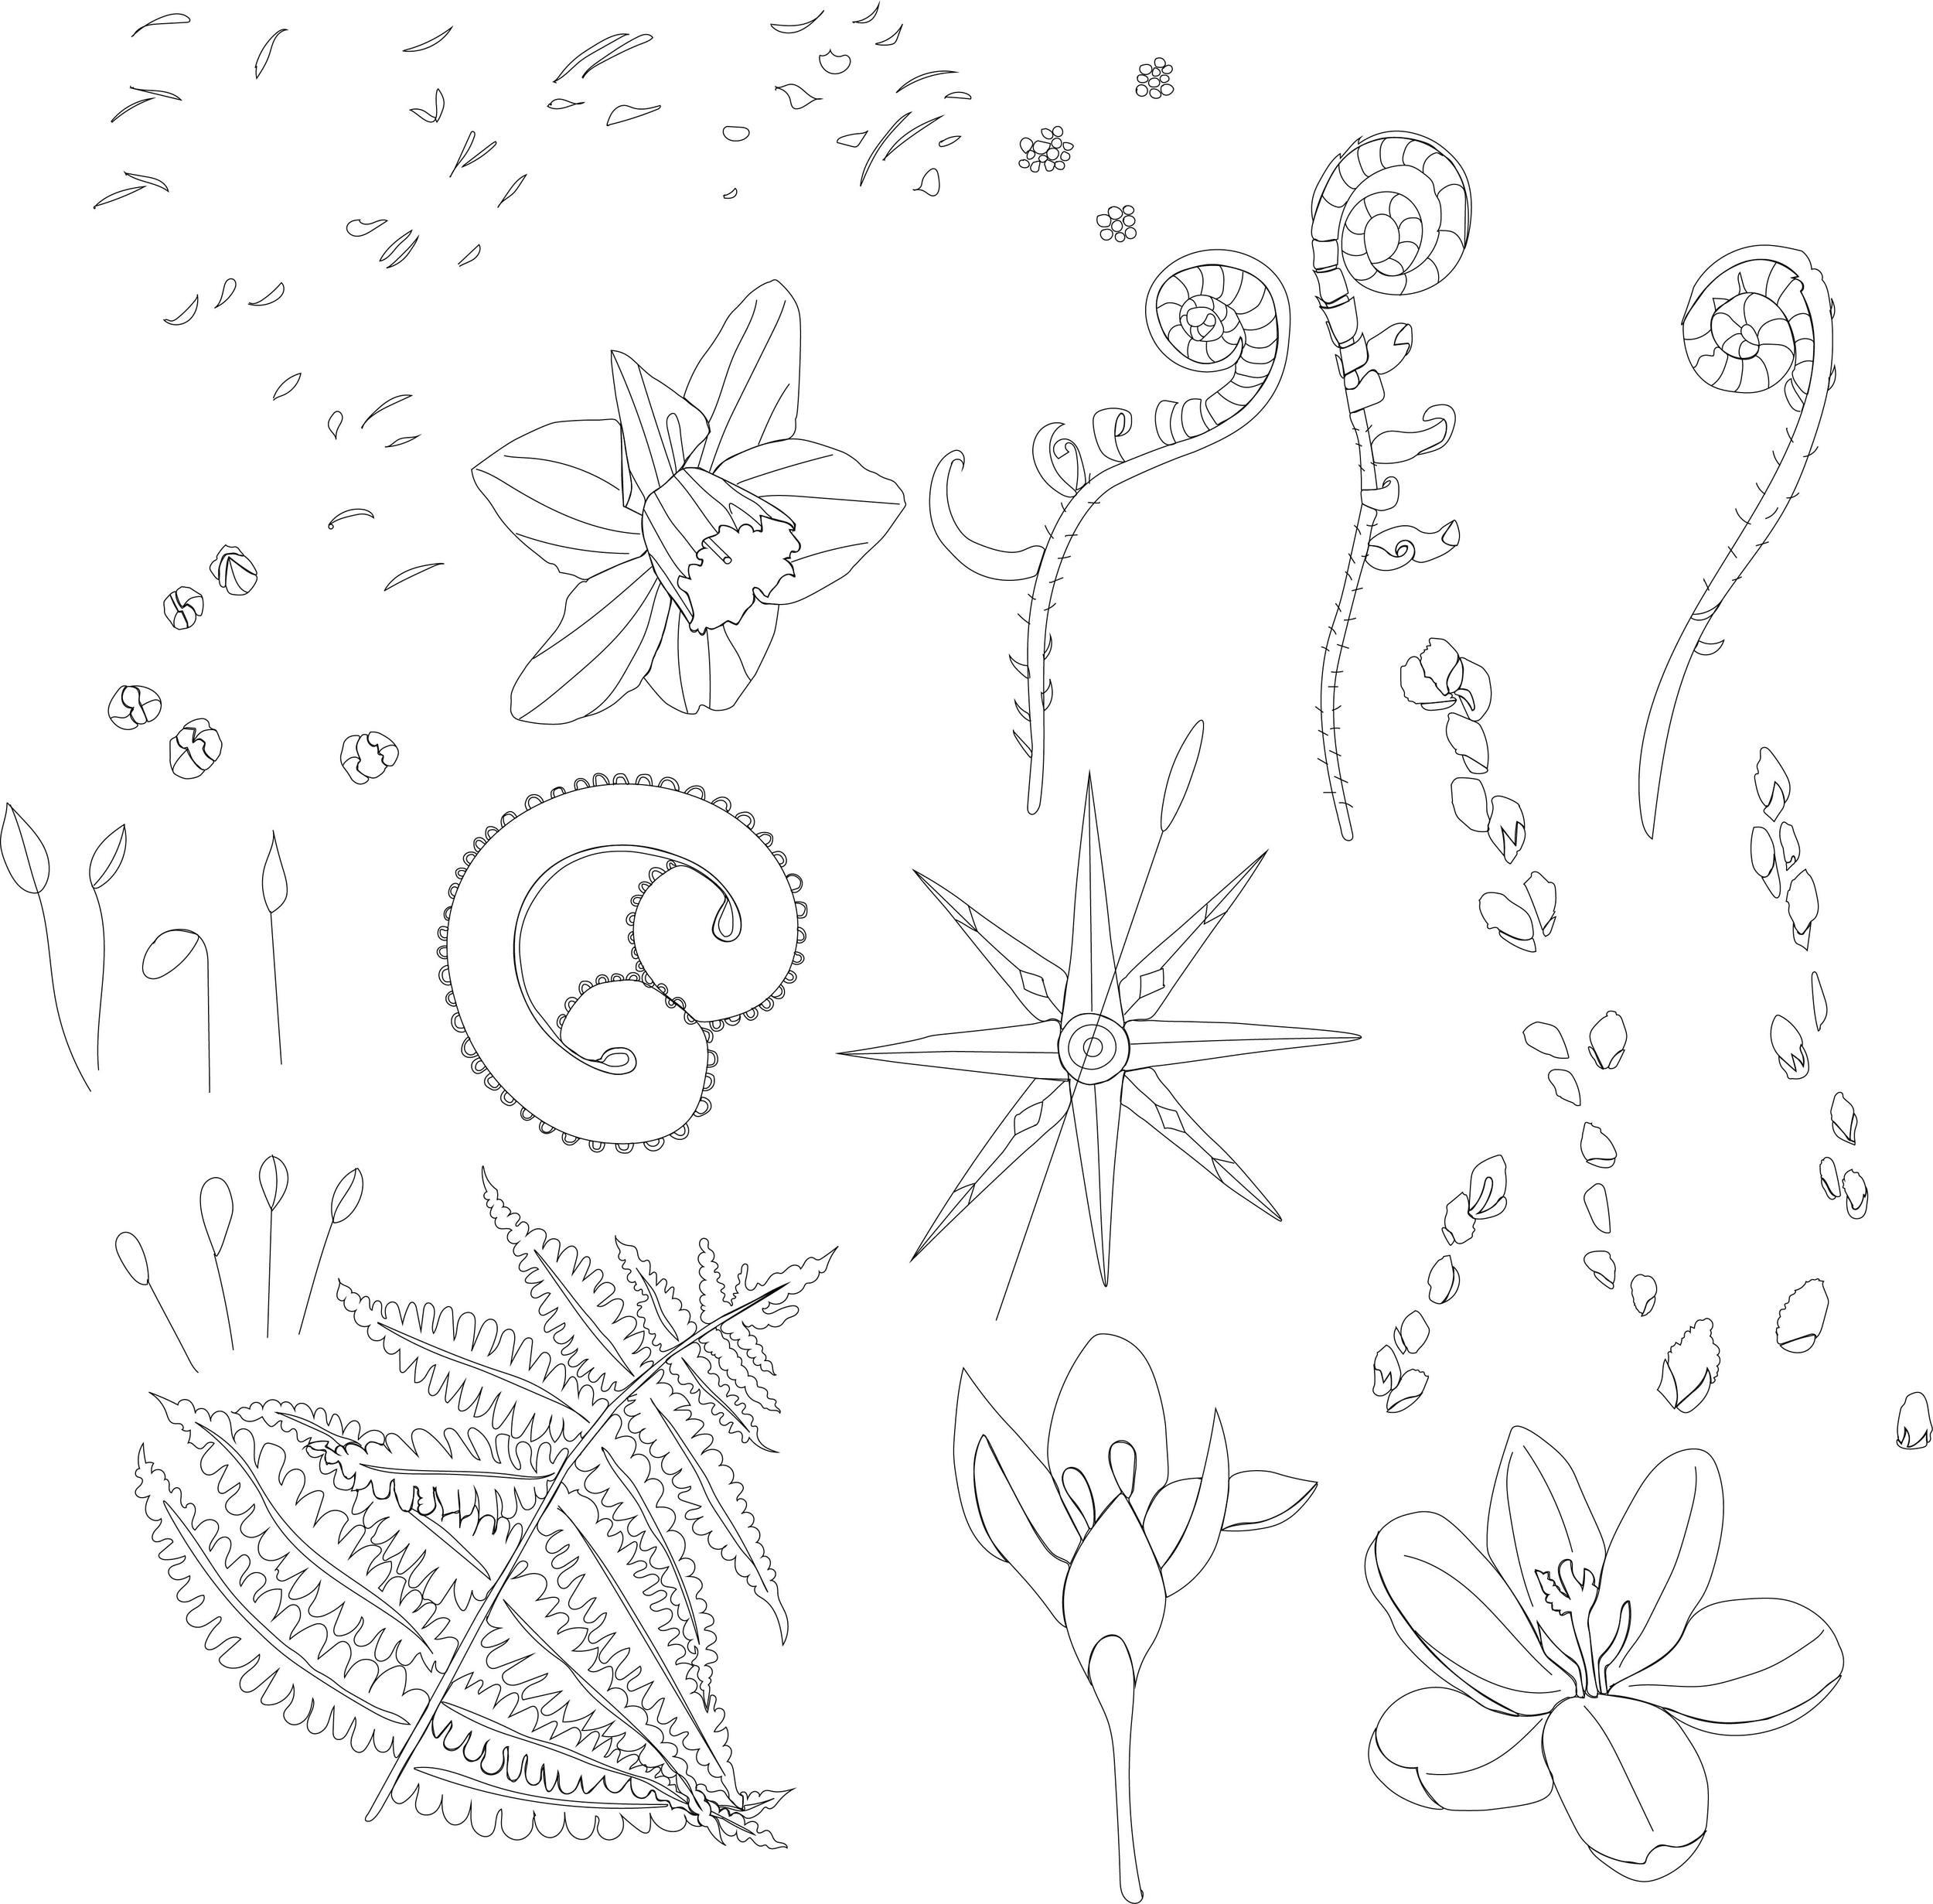 Vector drawings of my original pencil sketches